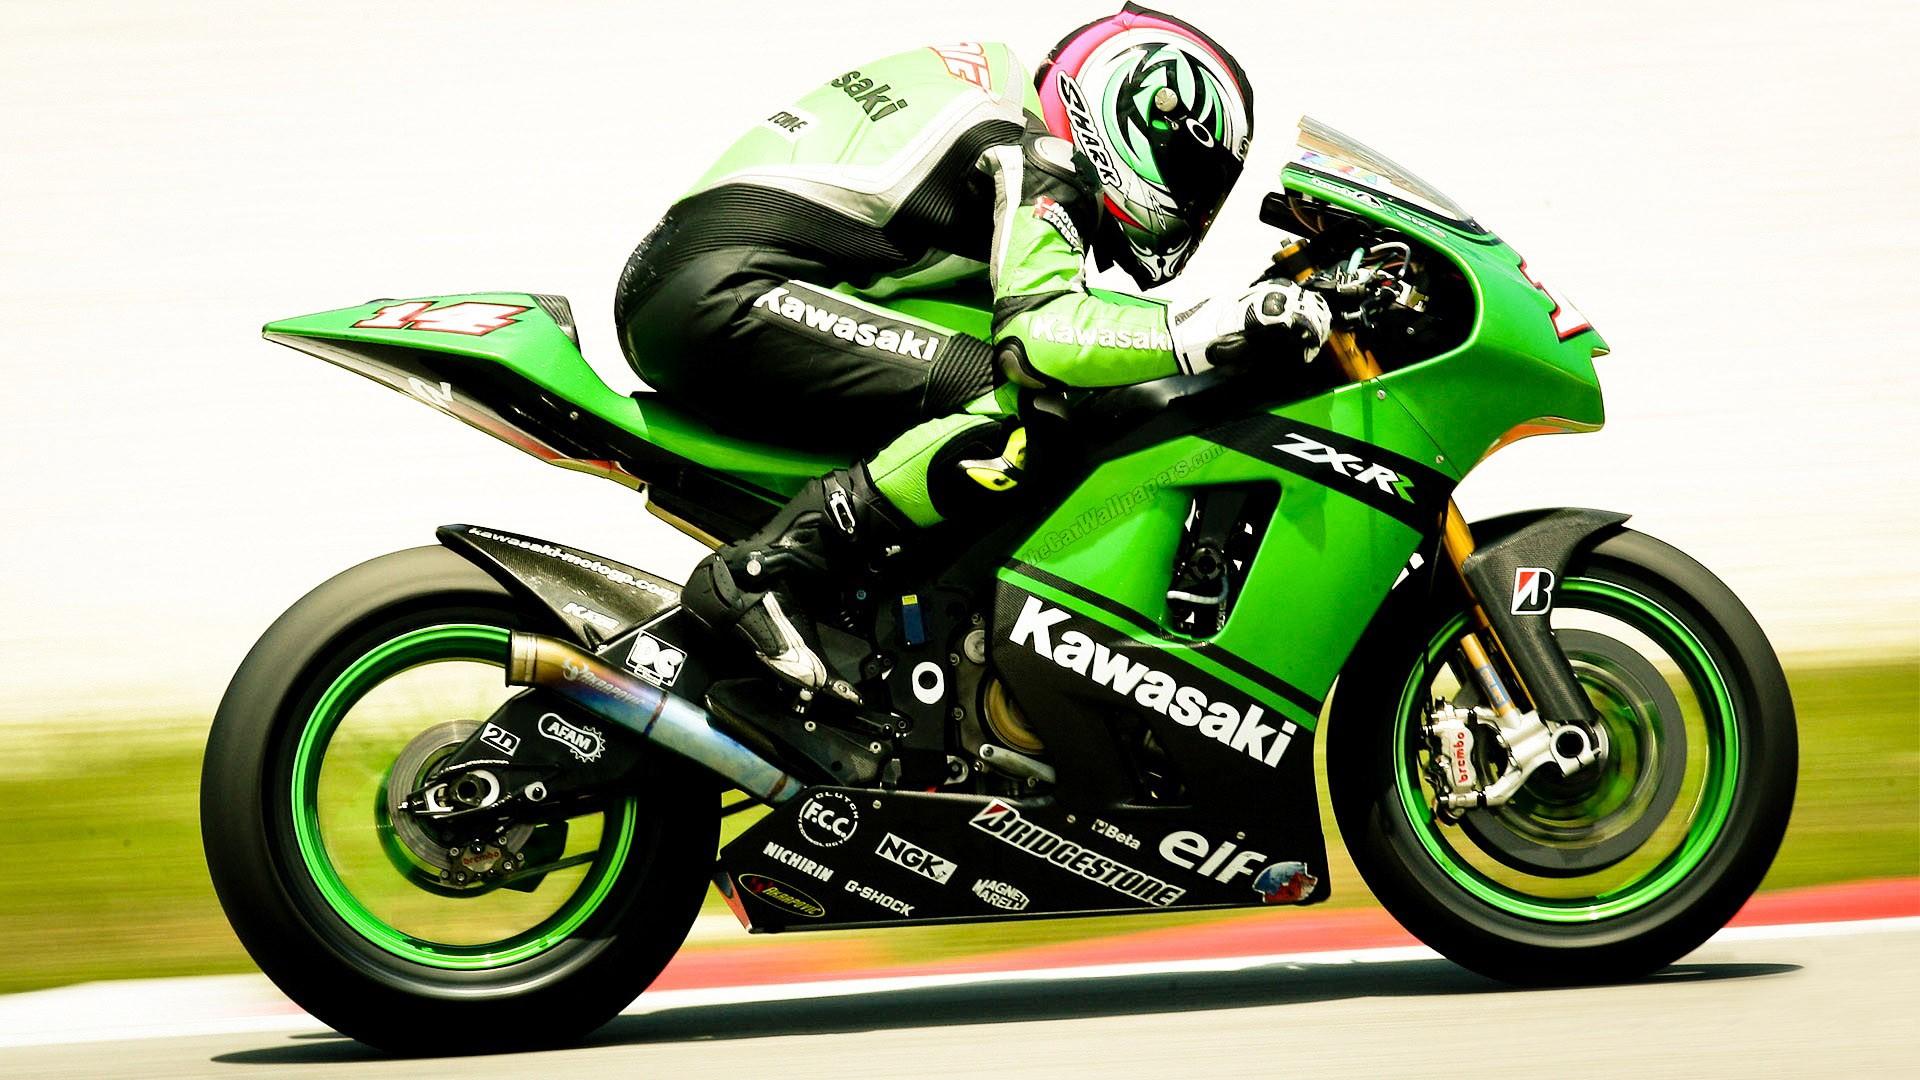 Kawasaki Racing MotoGP Wallpaper HD 9454 Wallpaper High Resolution 1920x1080